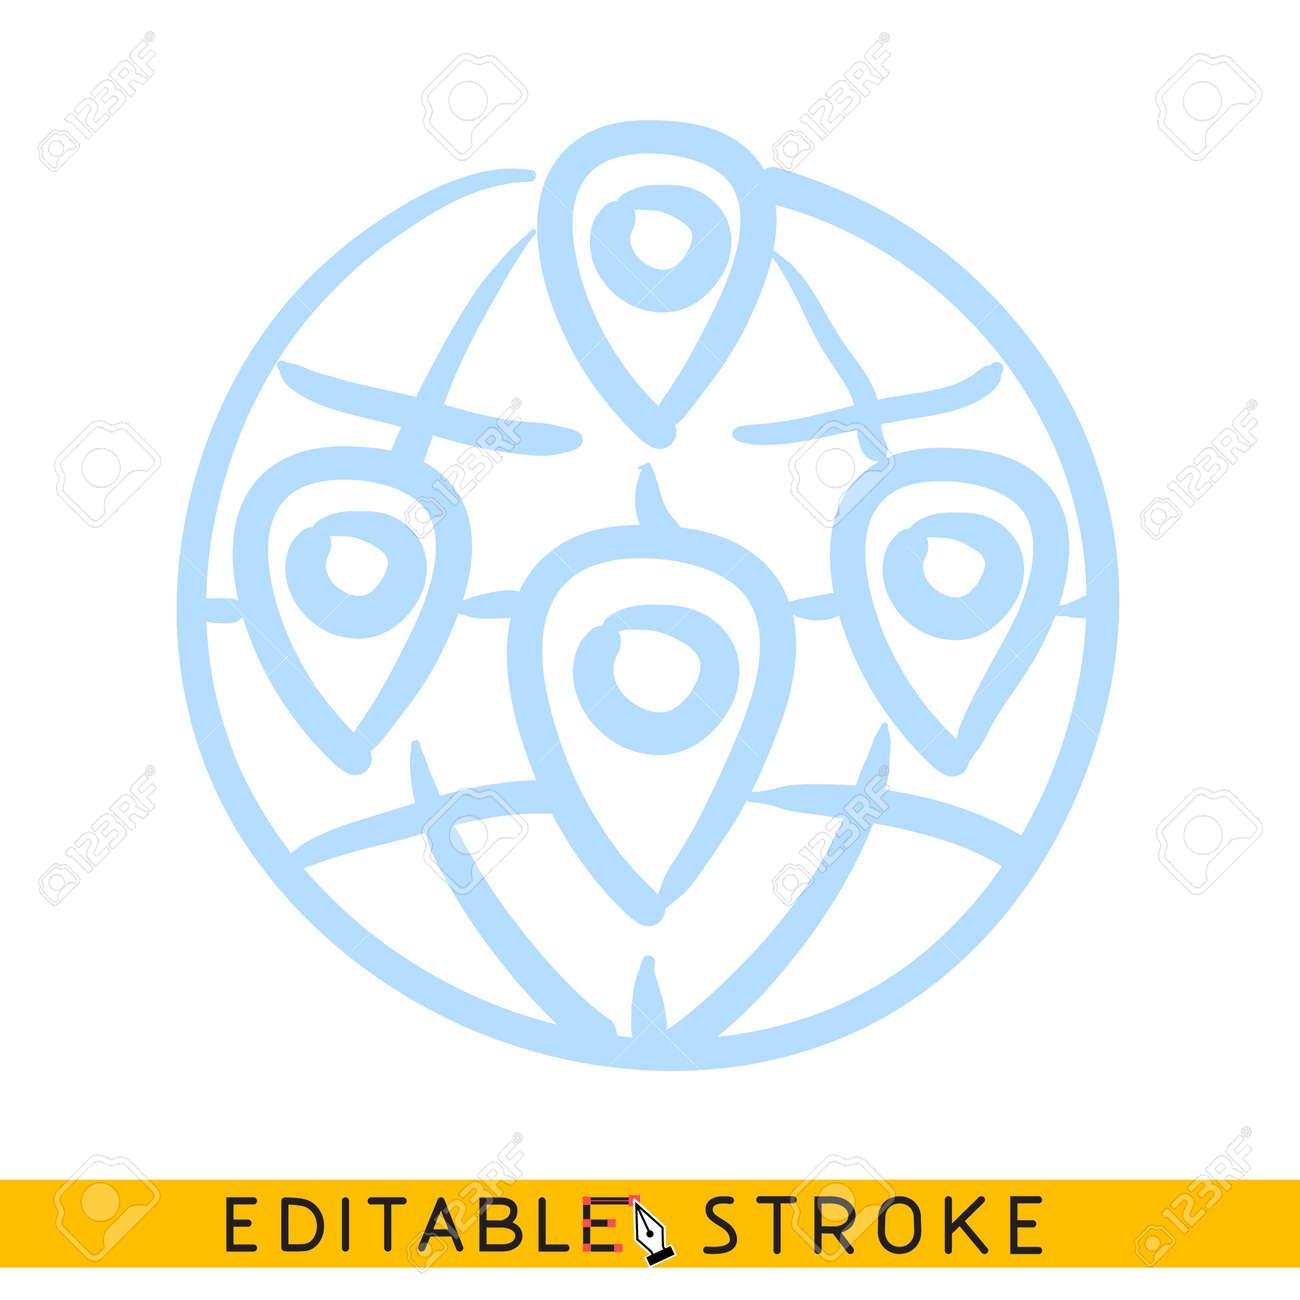 Glob with geo location pins icon. Line doodle sketch. Editable stroke icon. - 128415849